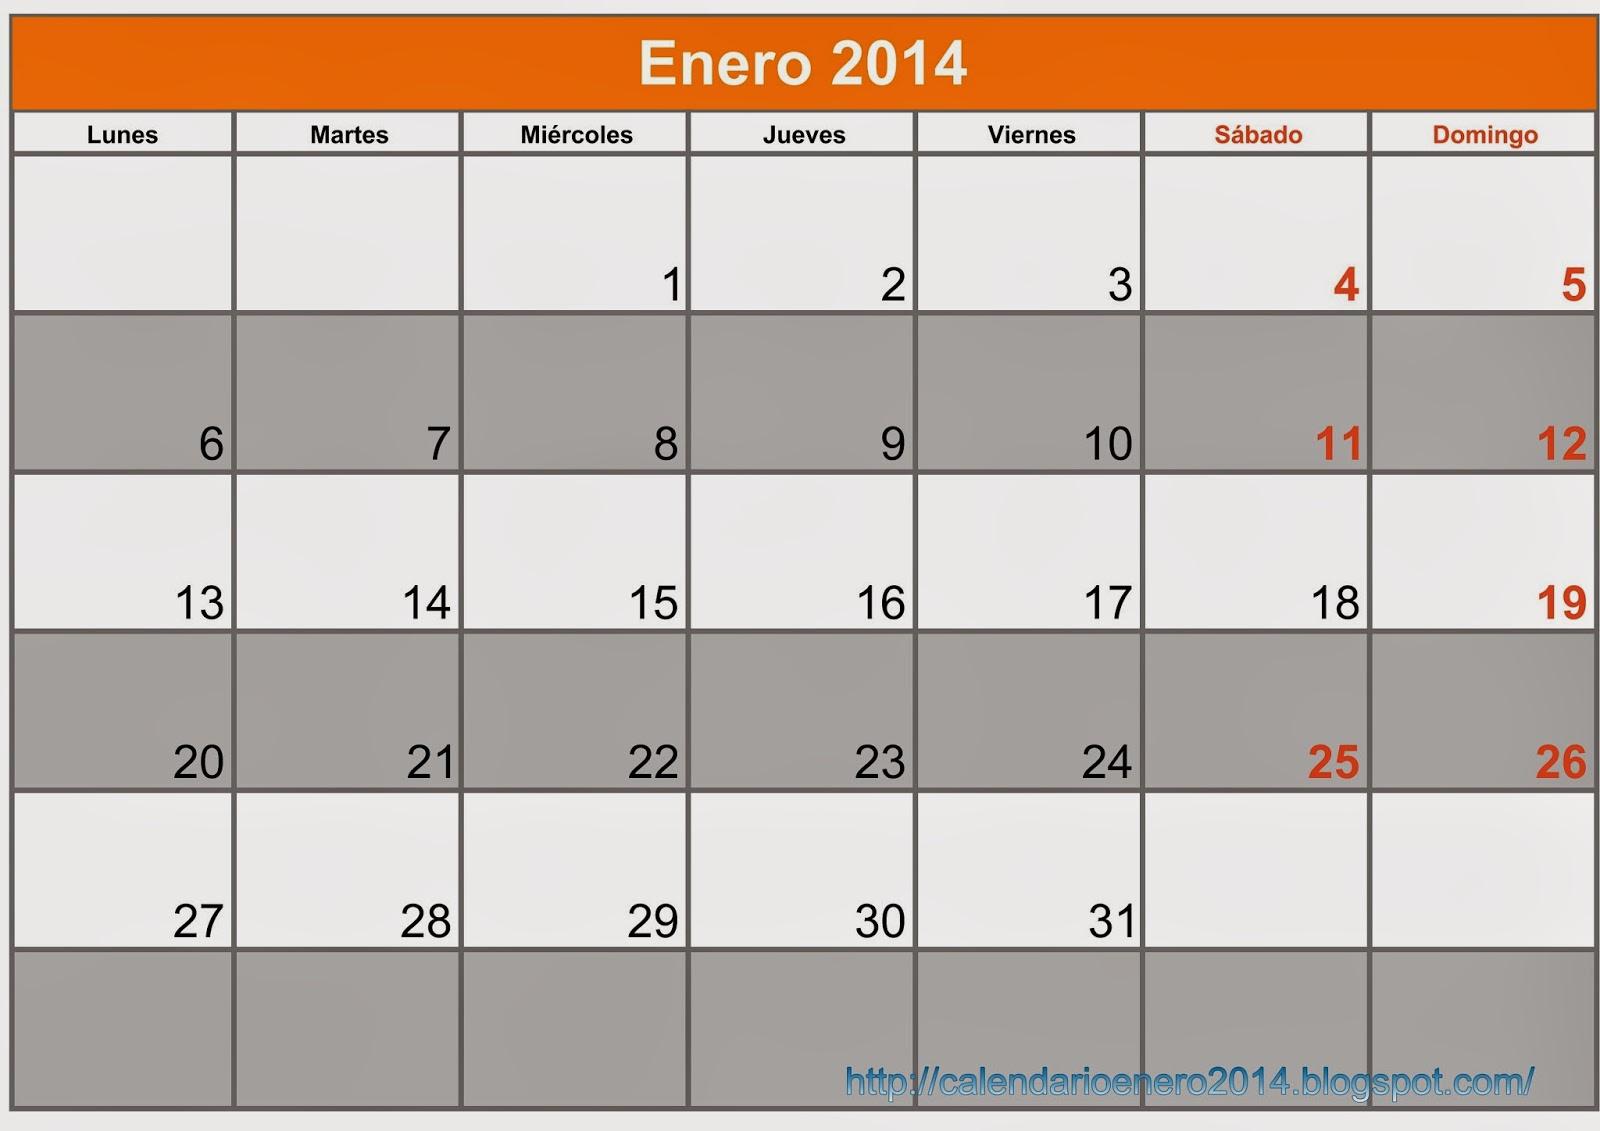 Enero 2014 para imprimir Word - Calendario Para Imprimir Enero 2014 ...